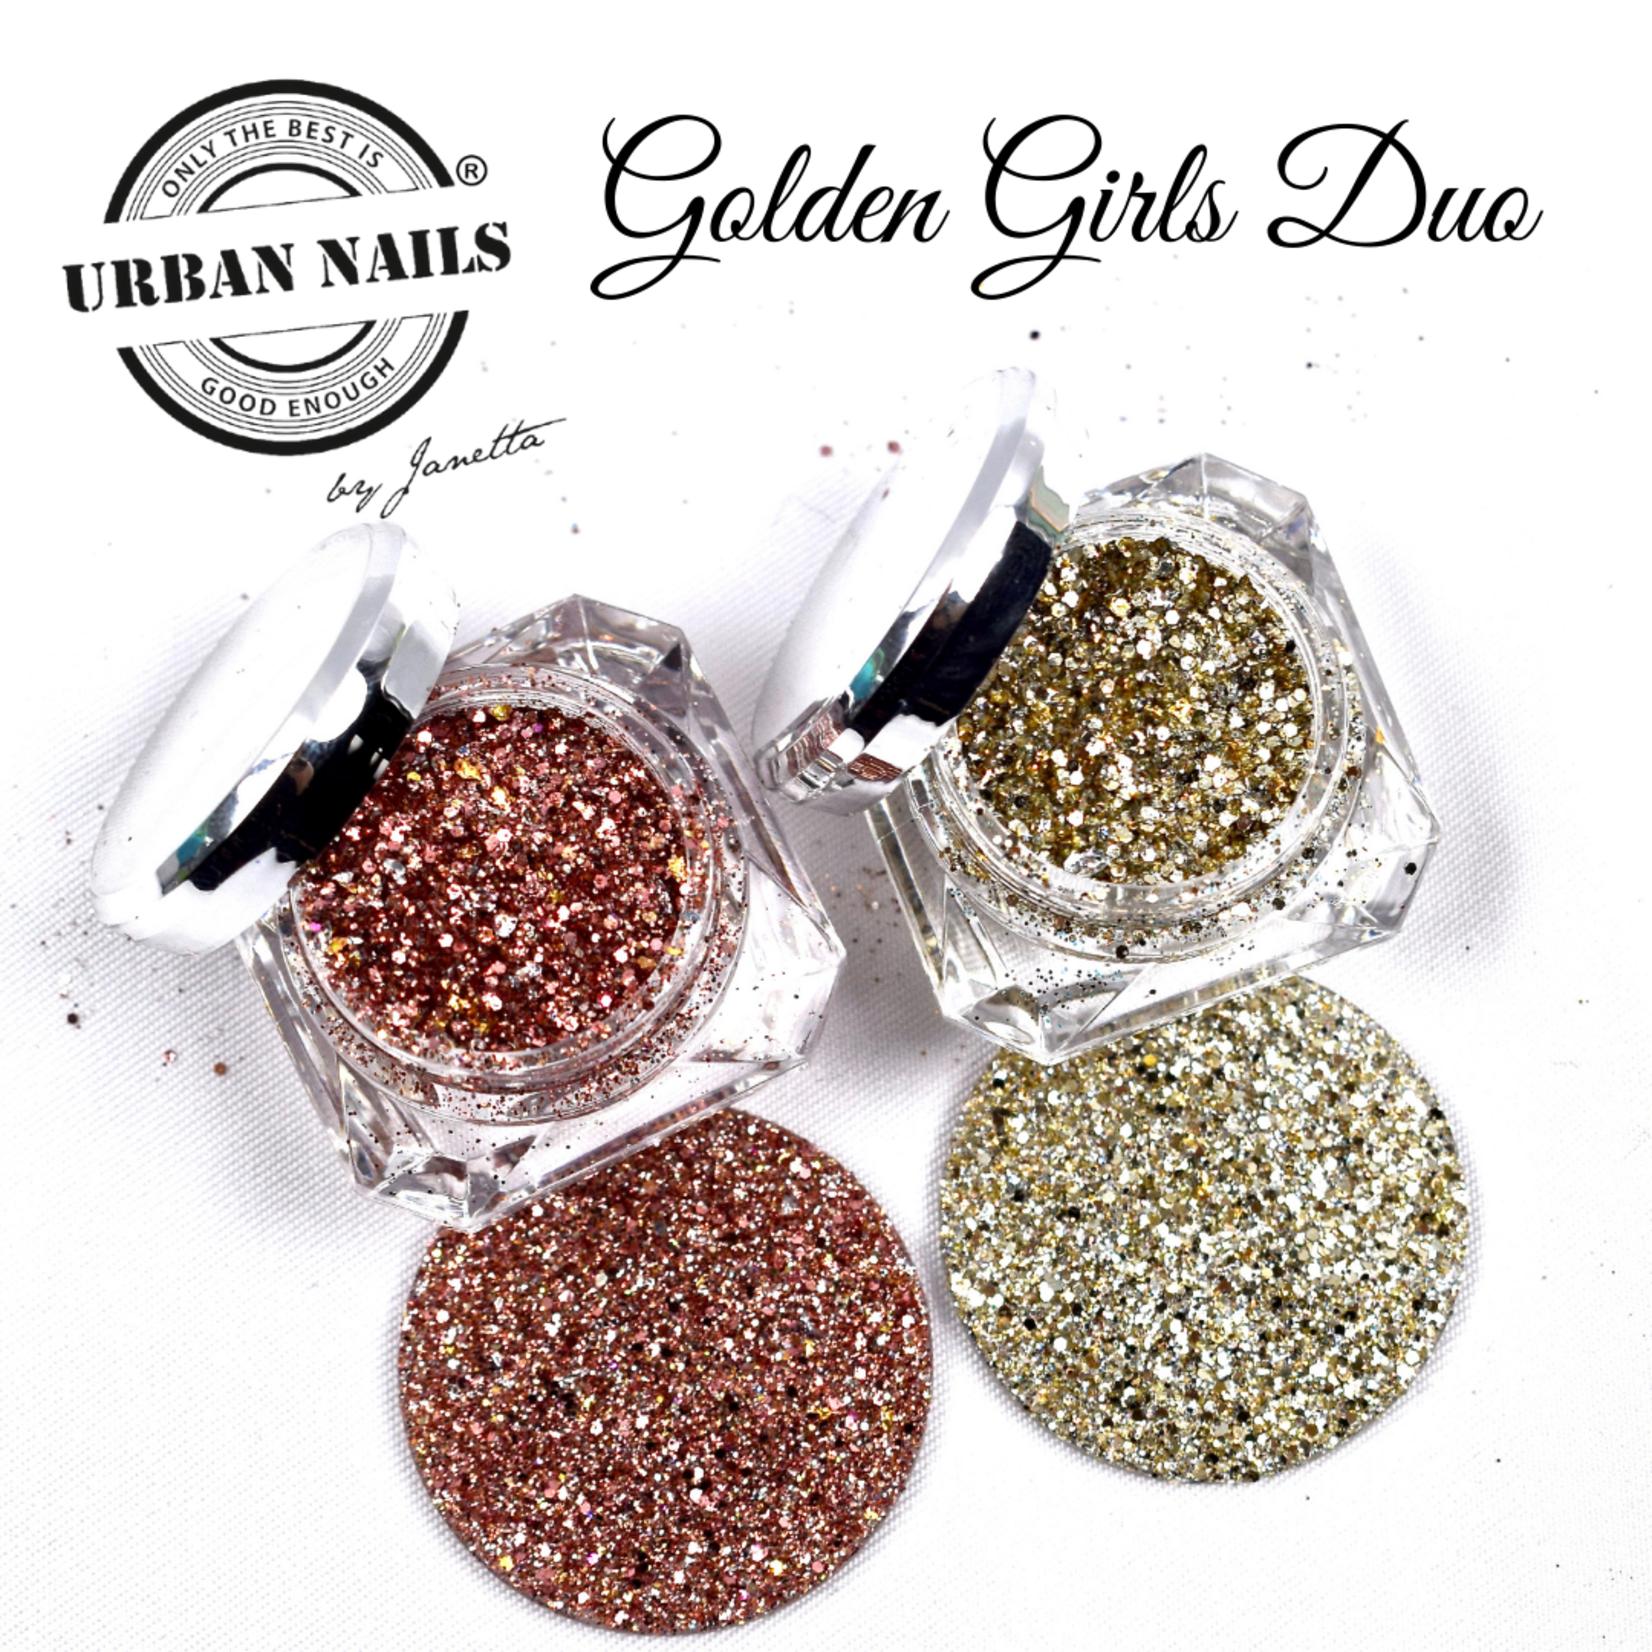 Urban Nails Golden Girls Duo